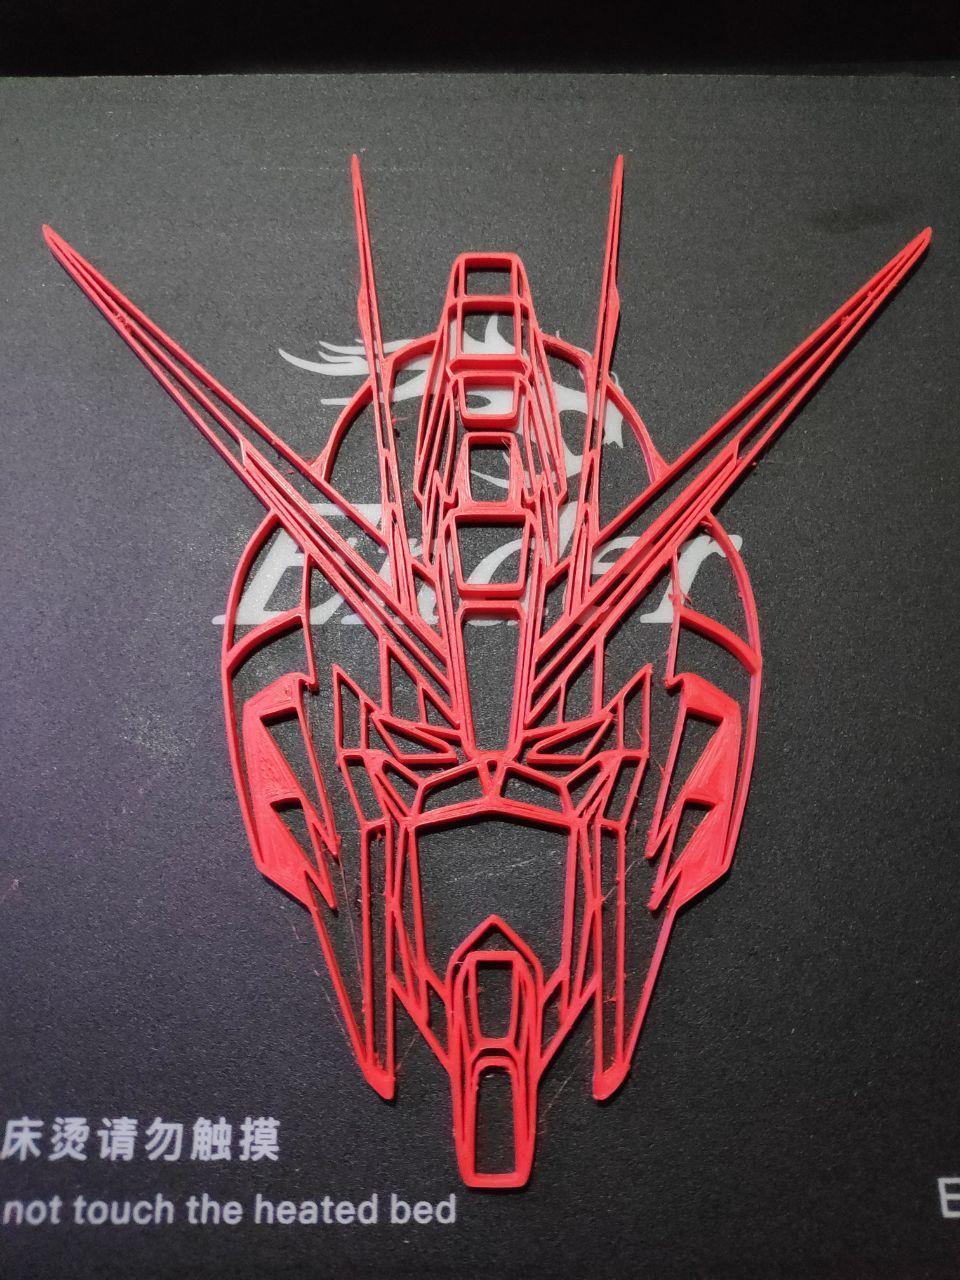 photo_2020-06-05_22-58-06.jpg Download free STL file Strike freedom gundam • Model to 3D print, 3DEioszd